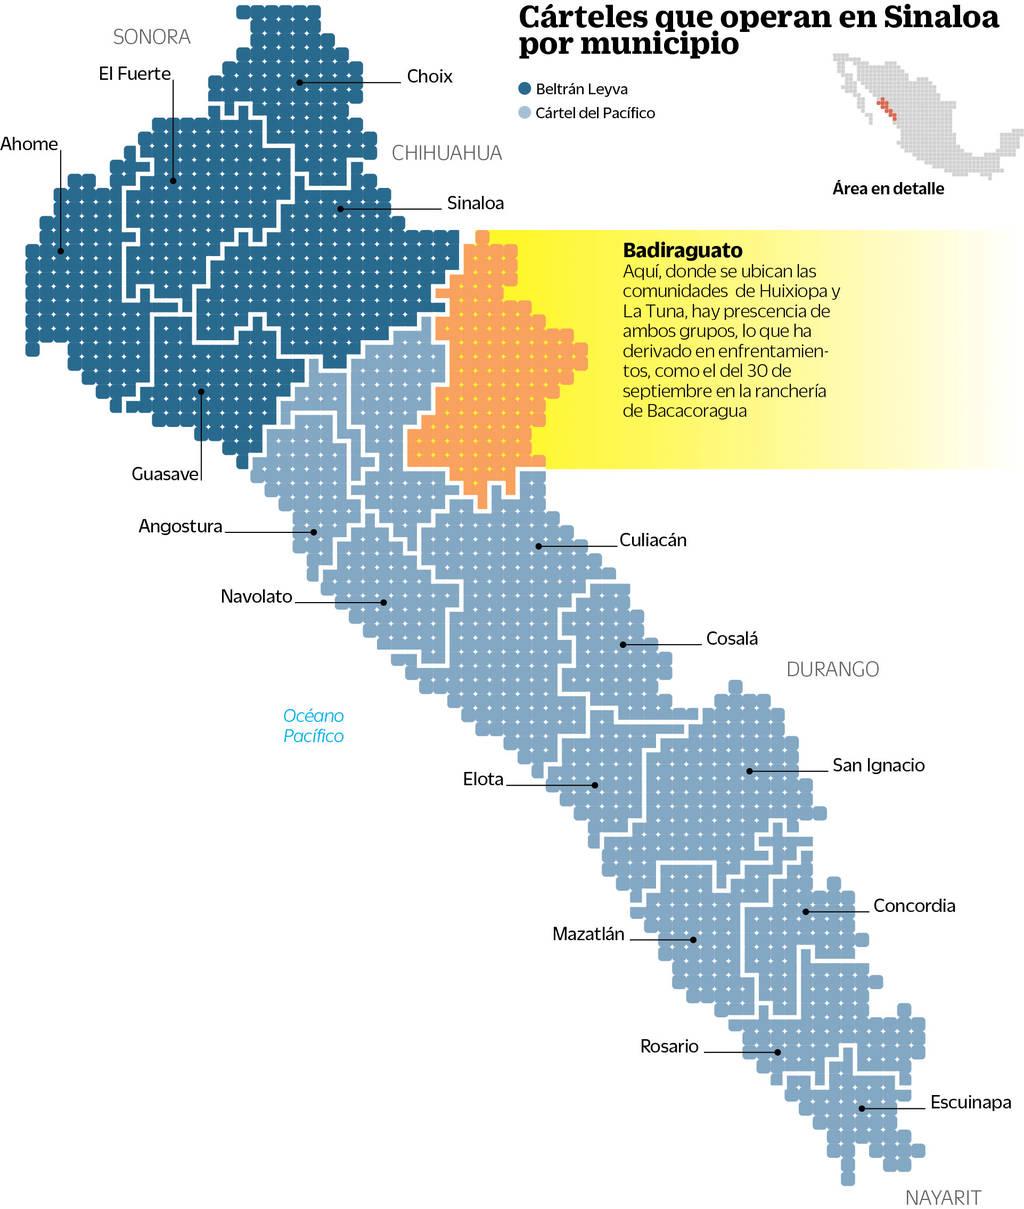 Narcojuniors Se Disputan 18 Alcaldias De Sinaloa Siglo Torreon